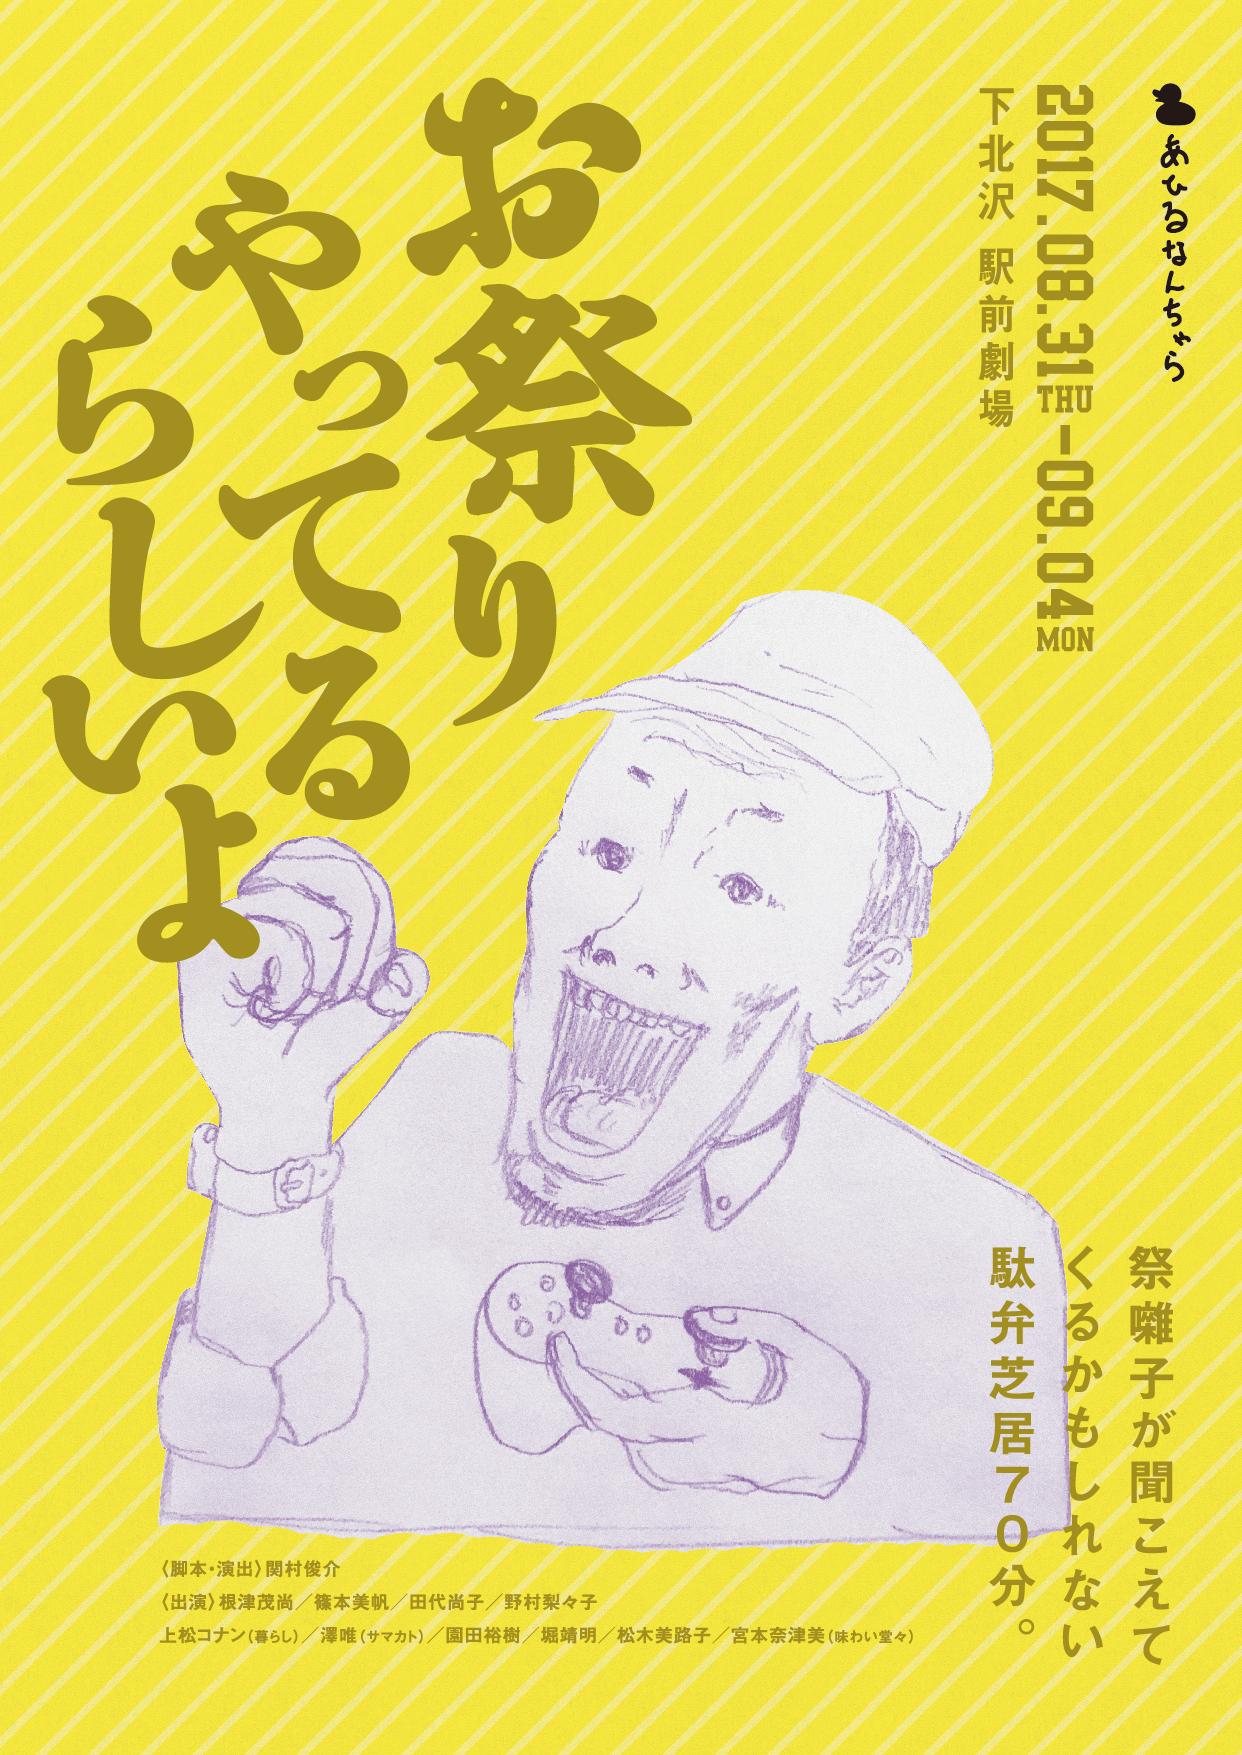 http://www.somecut.com/img/log/matsuriomote.jpg